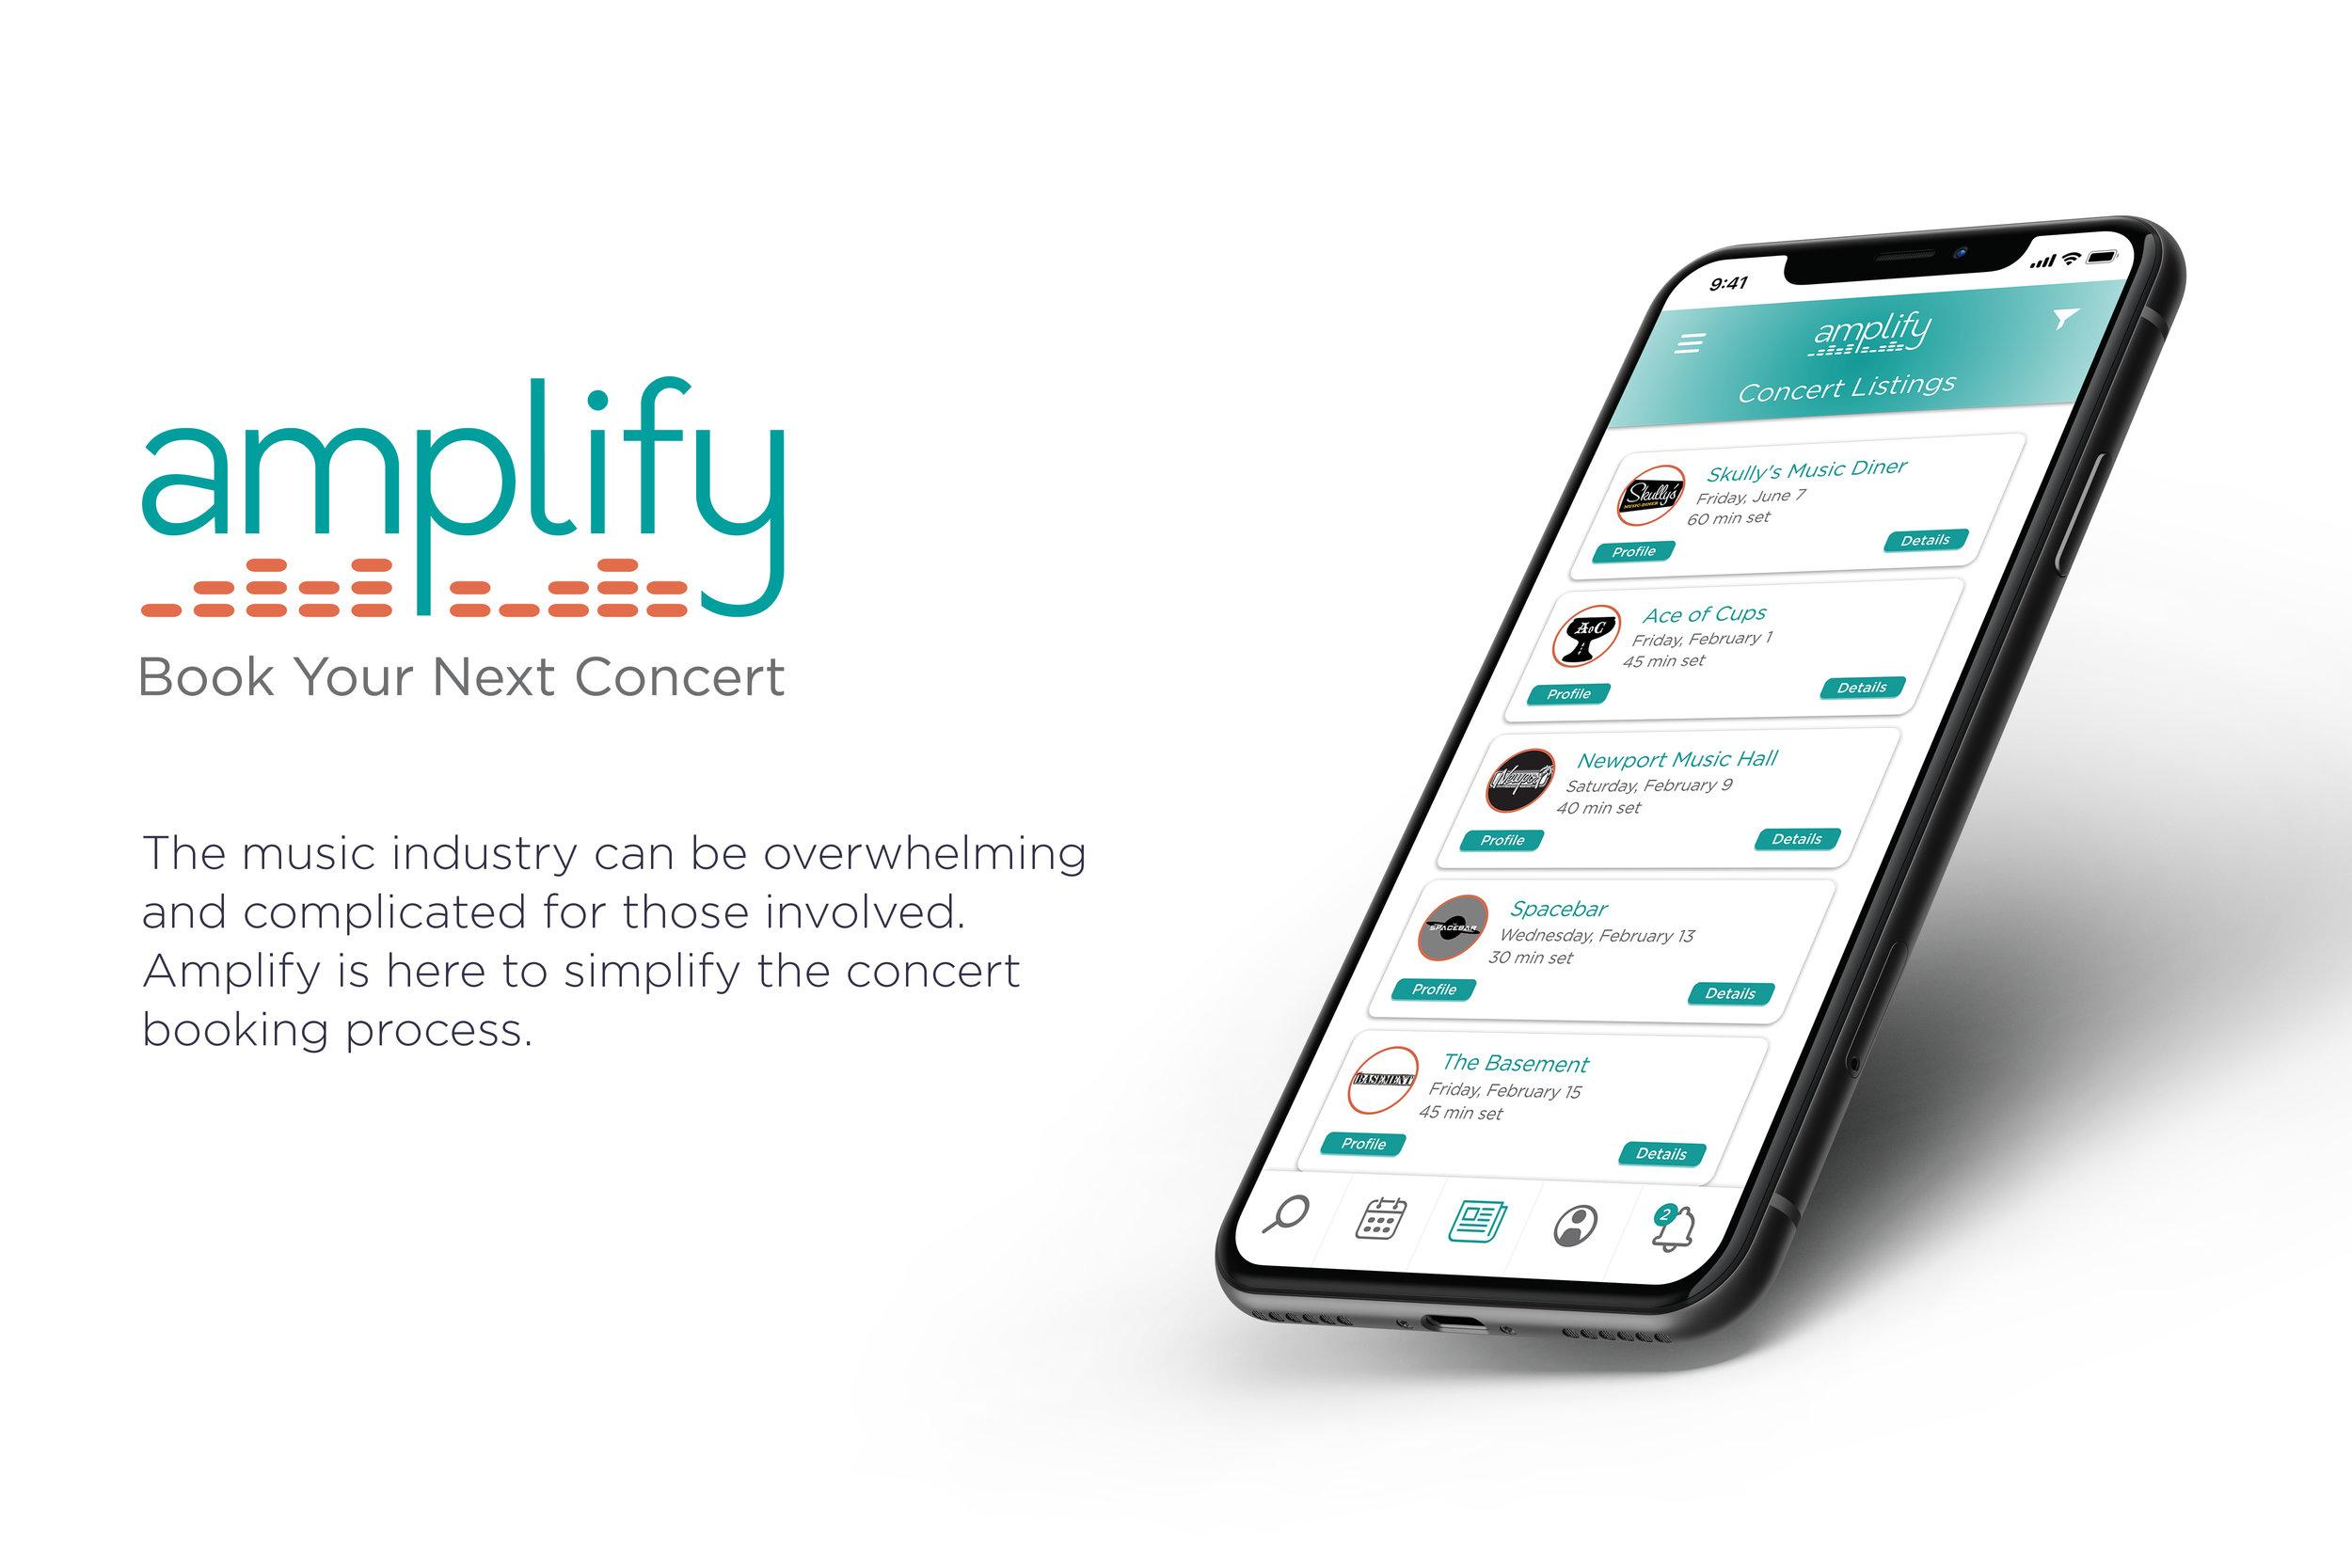 Amplify Image_2.jpg